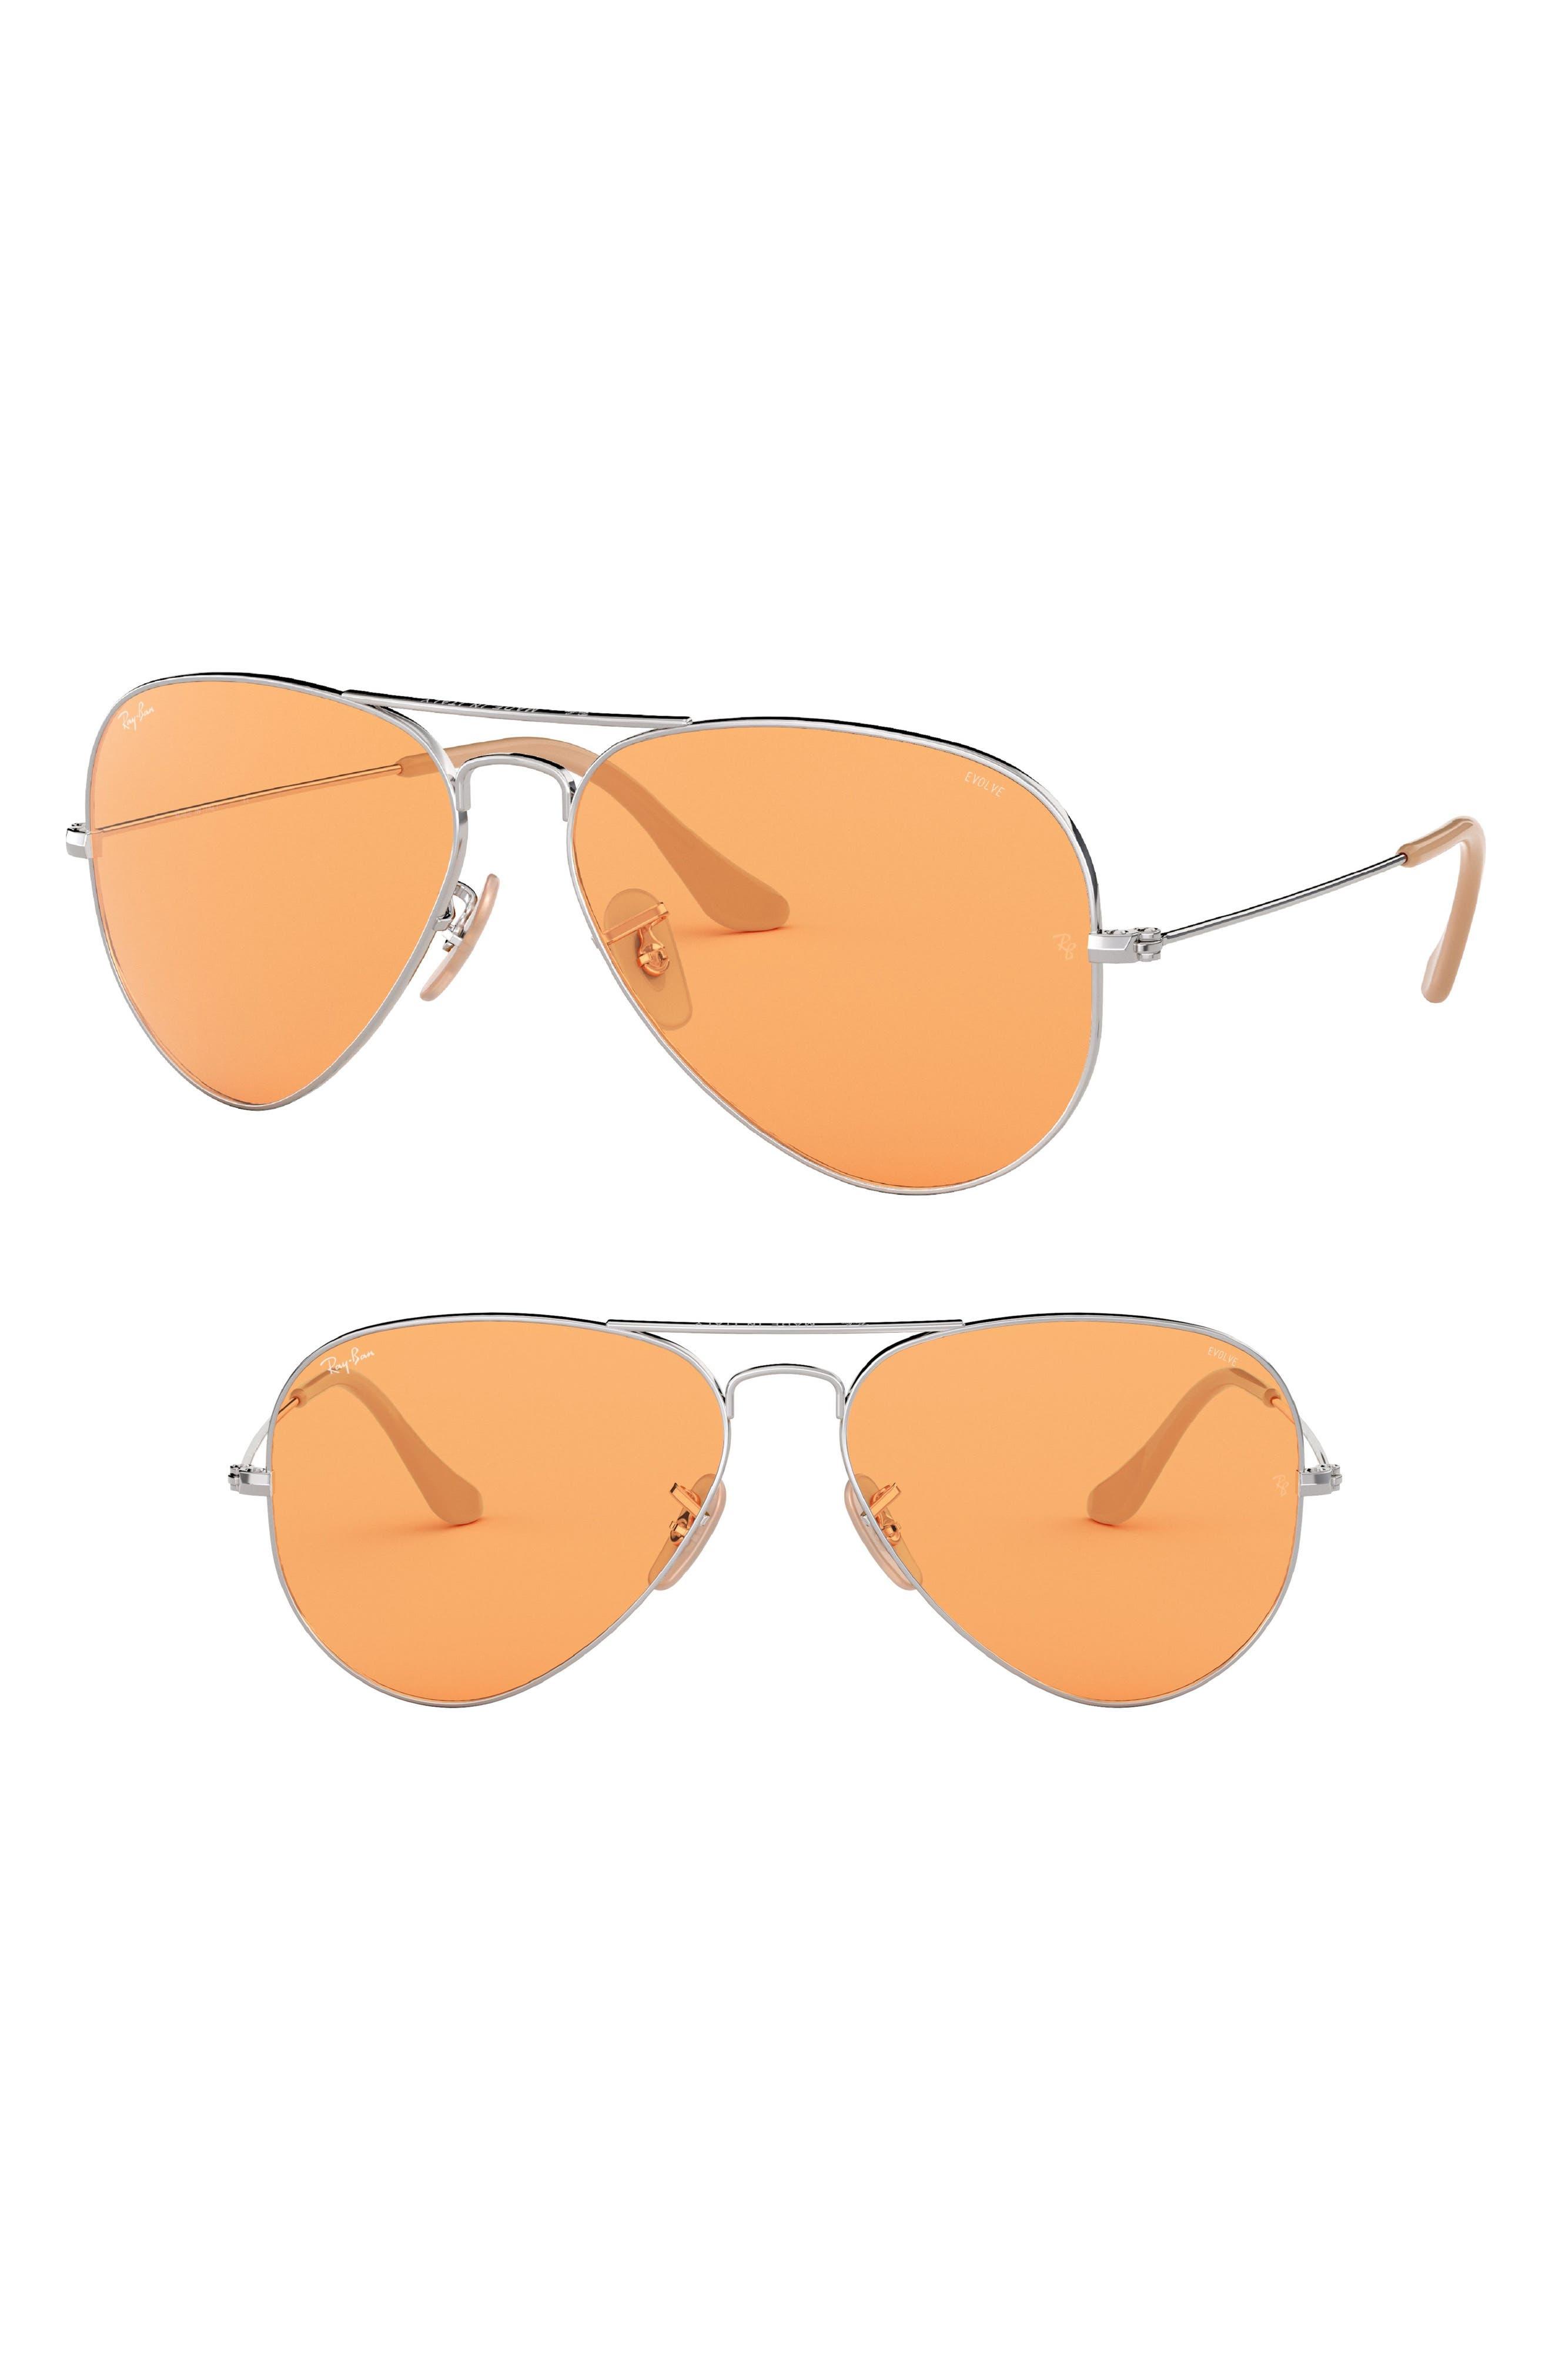 Image of Ray-Ban Evolve 55mm Photochromic Aviator Sunglasses